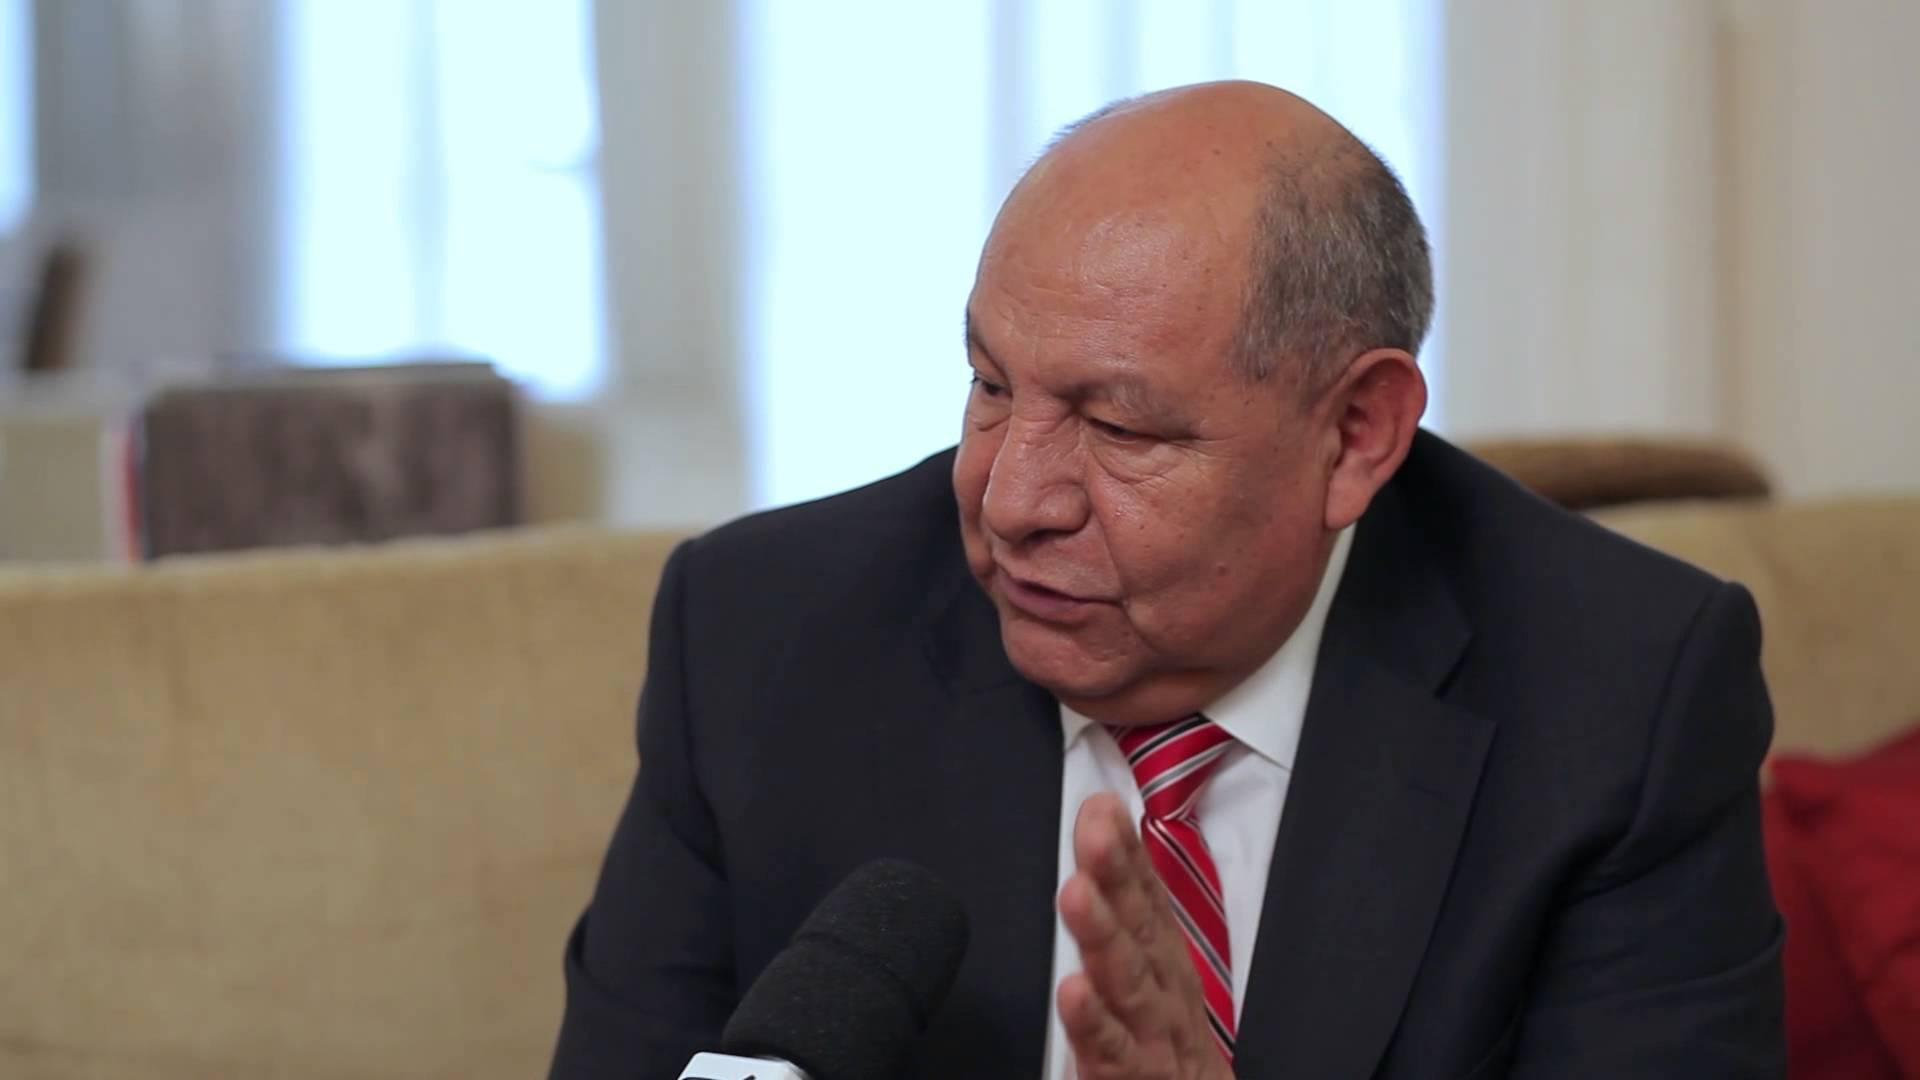 Notícias Adventistas – A Única Esperança – Pastor Alejandro Bullón